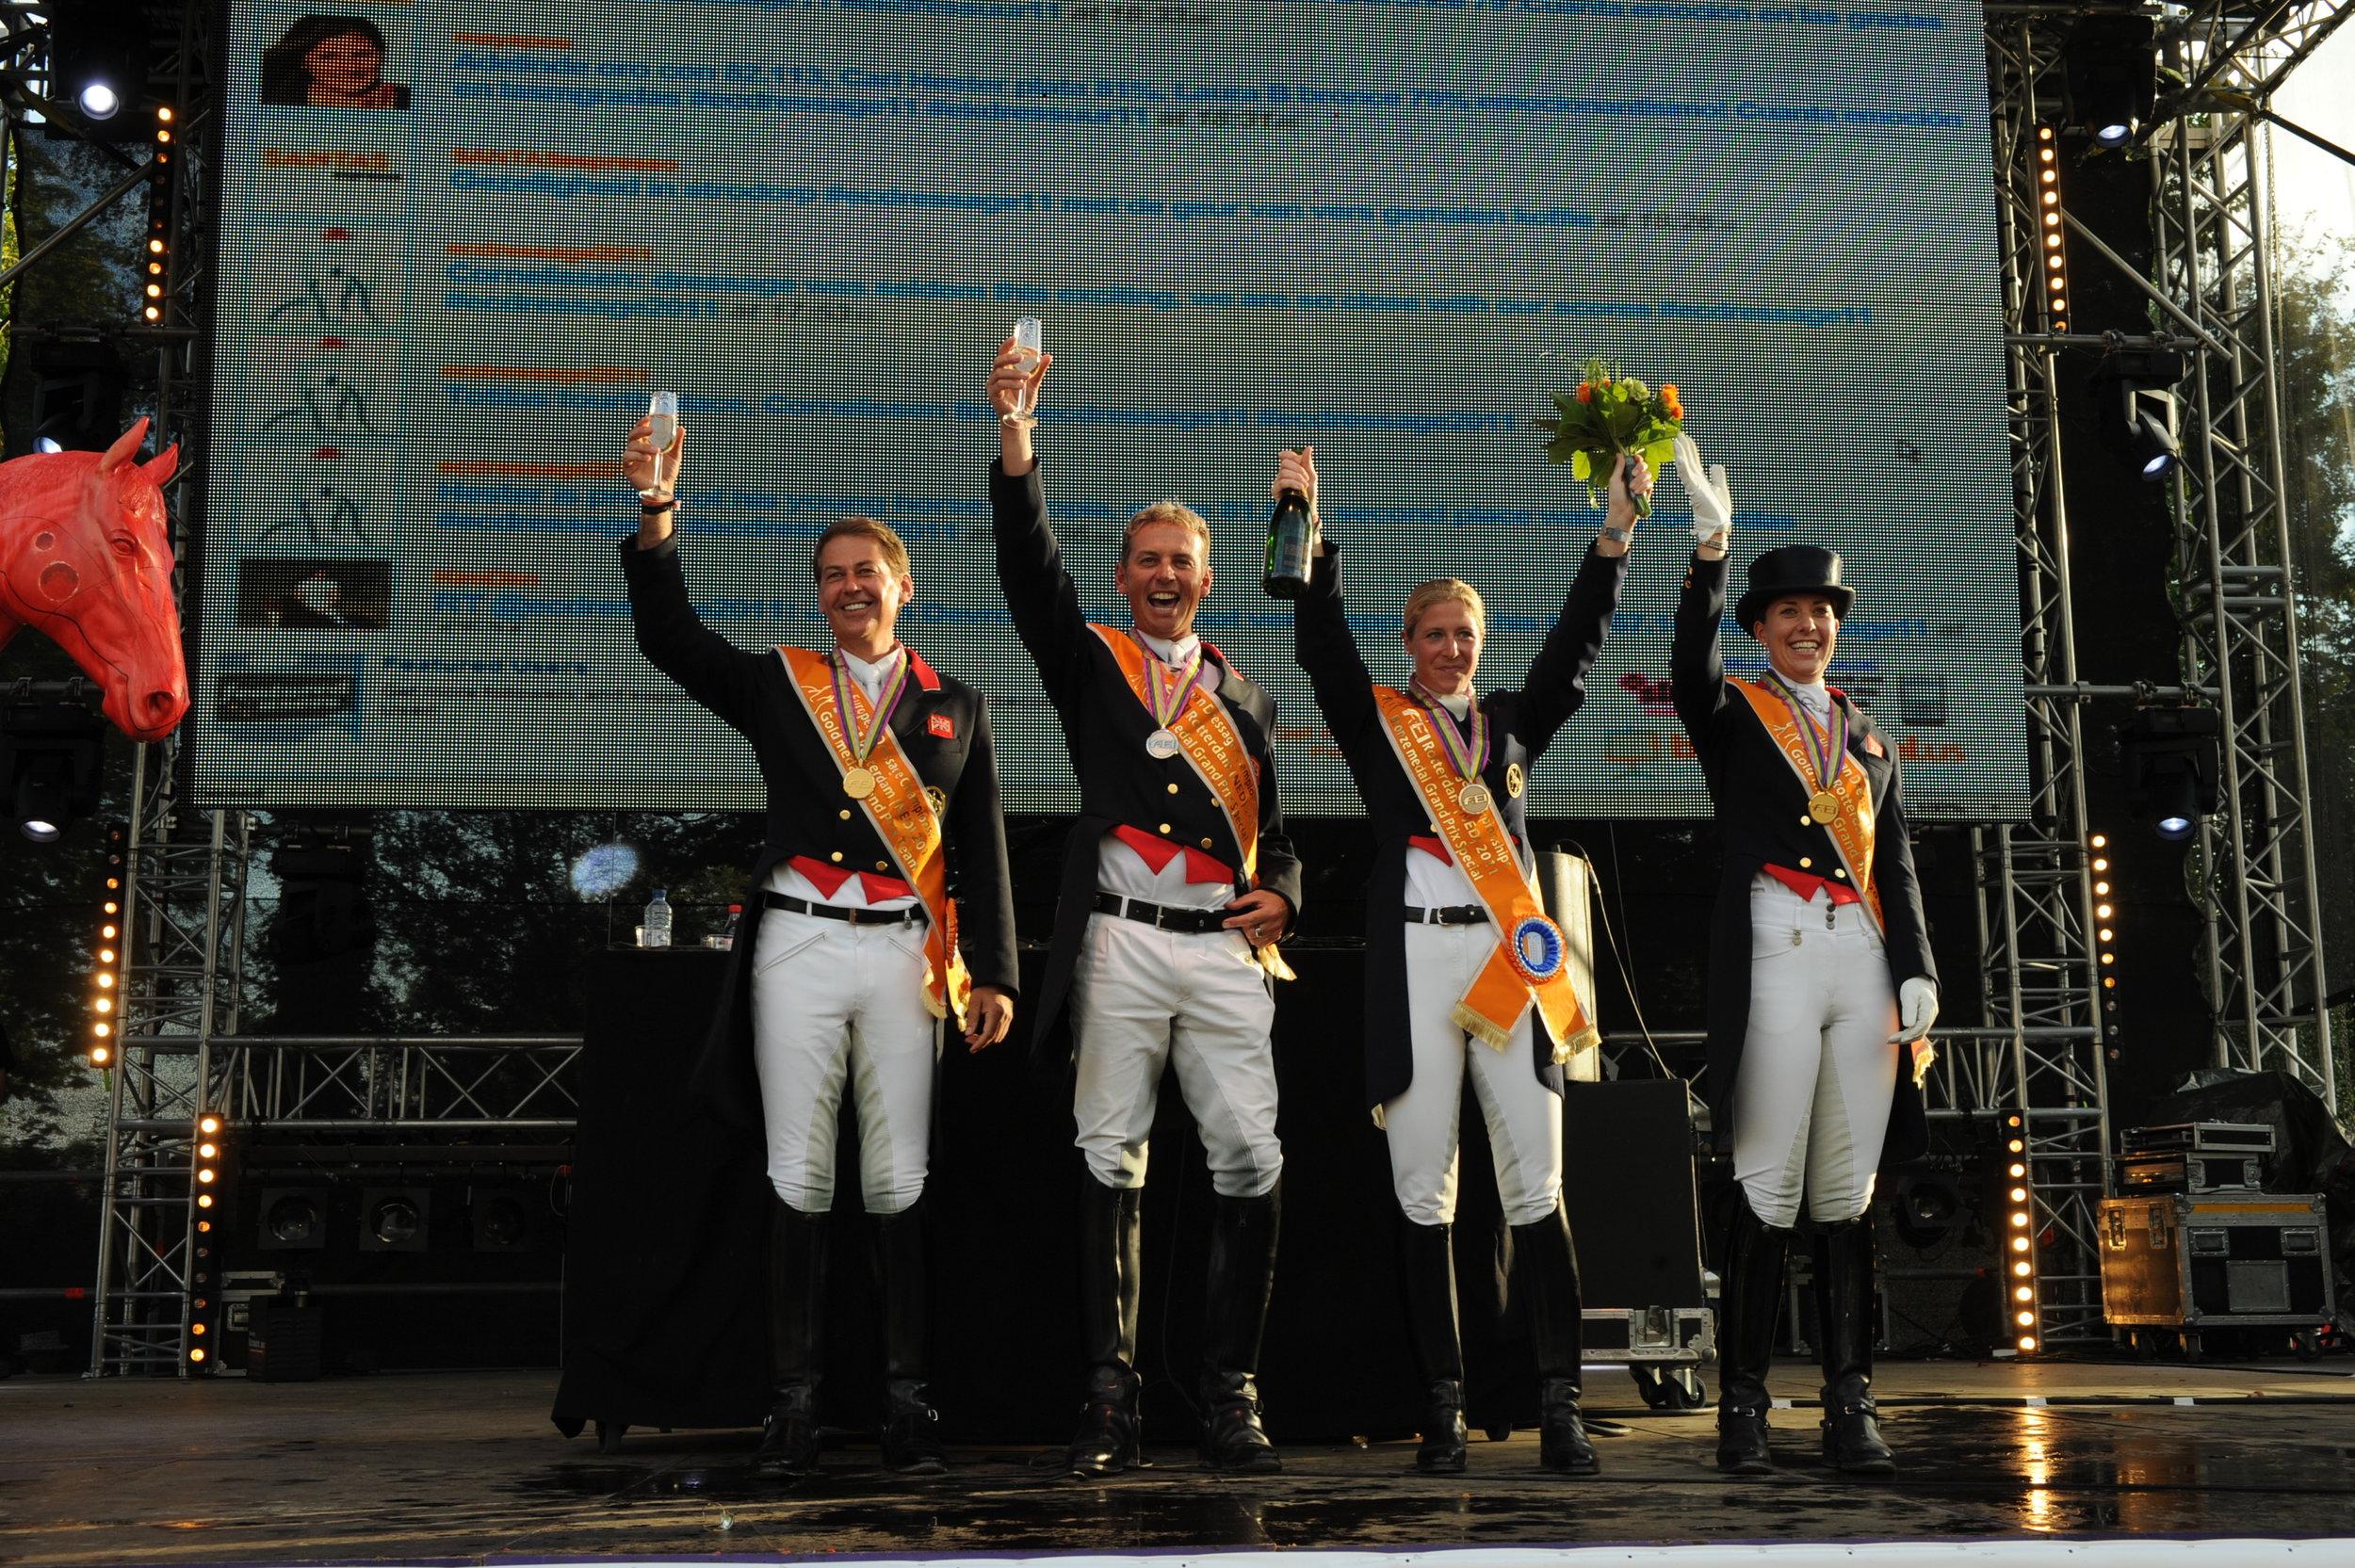 Carl and teammates European Championships 2011.JPG